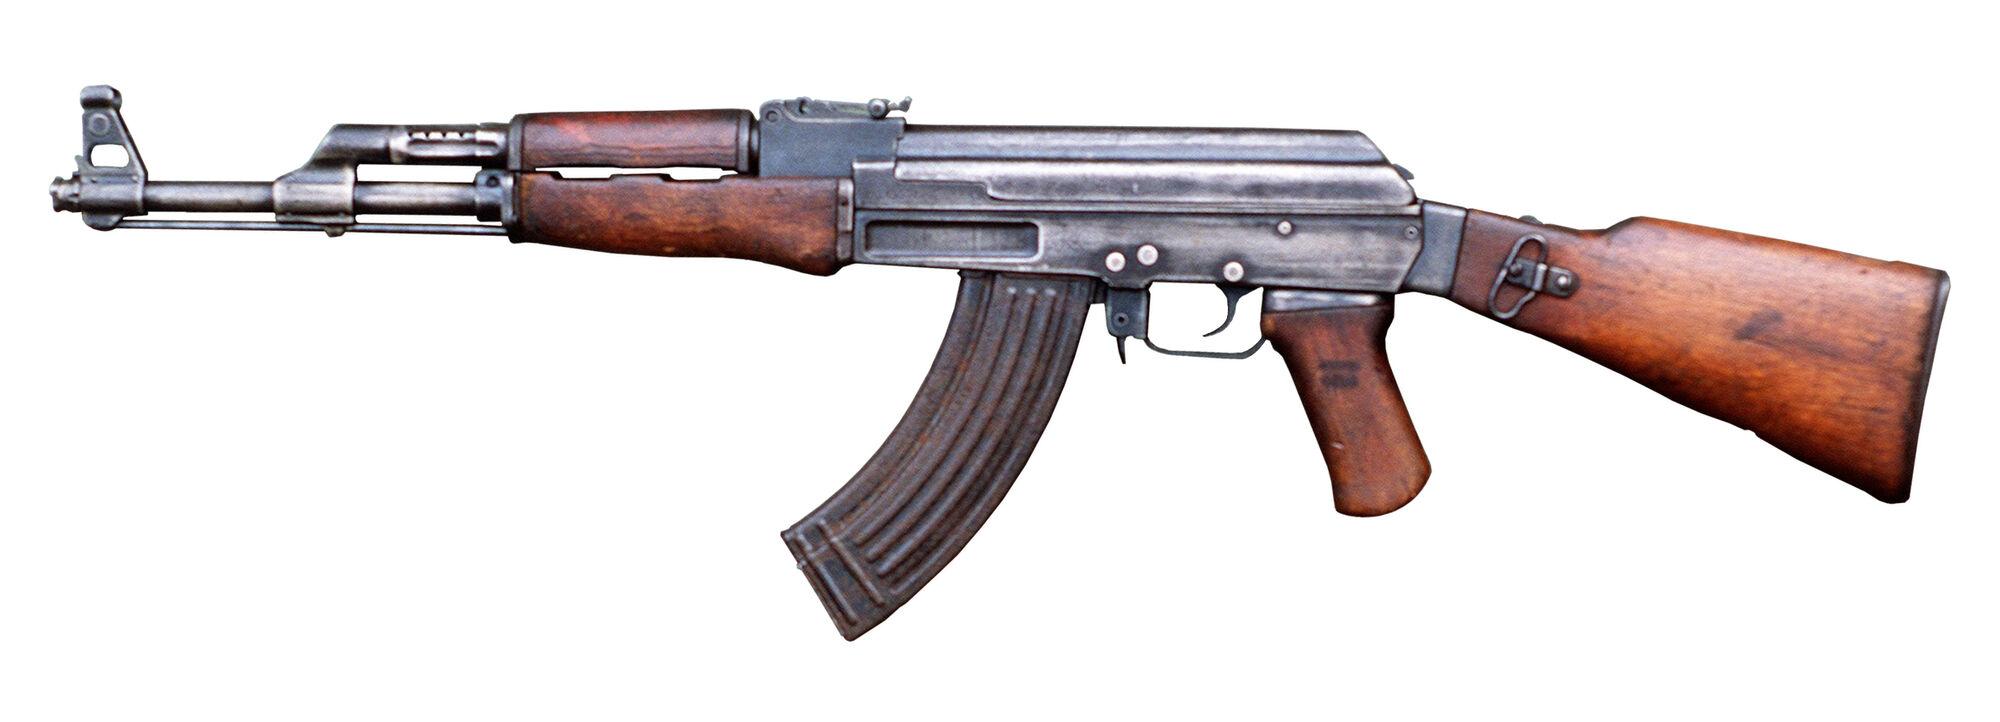 Kalashnikov Pneumatic Gun for Weapon Fans